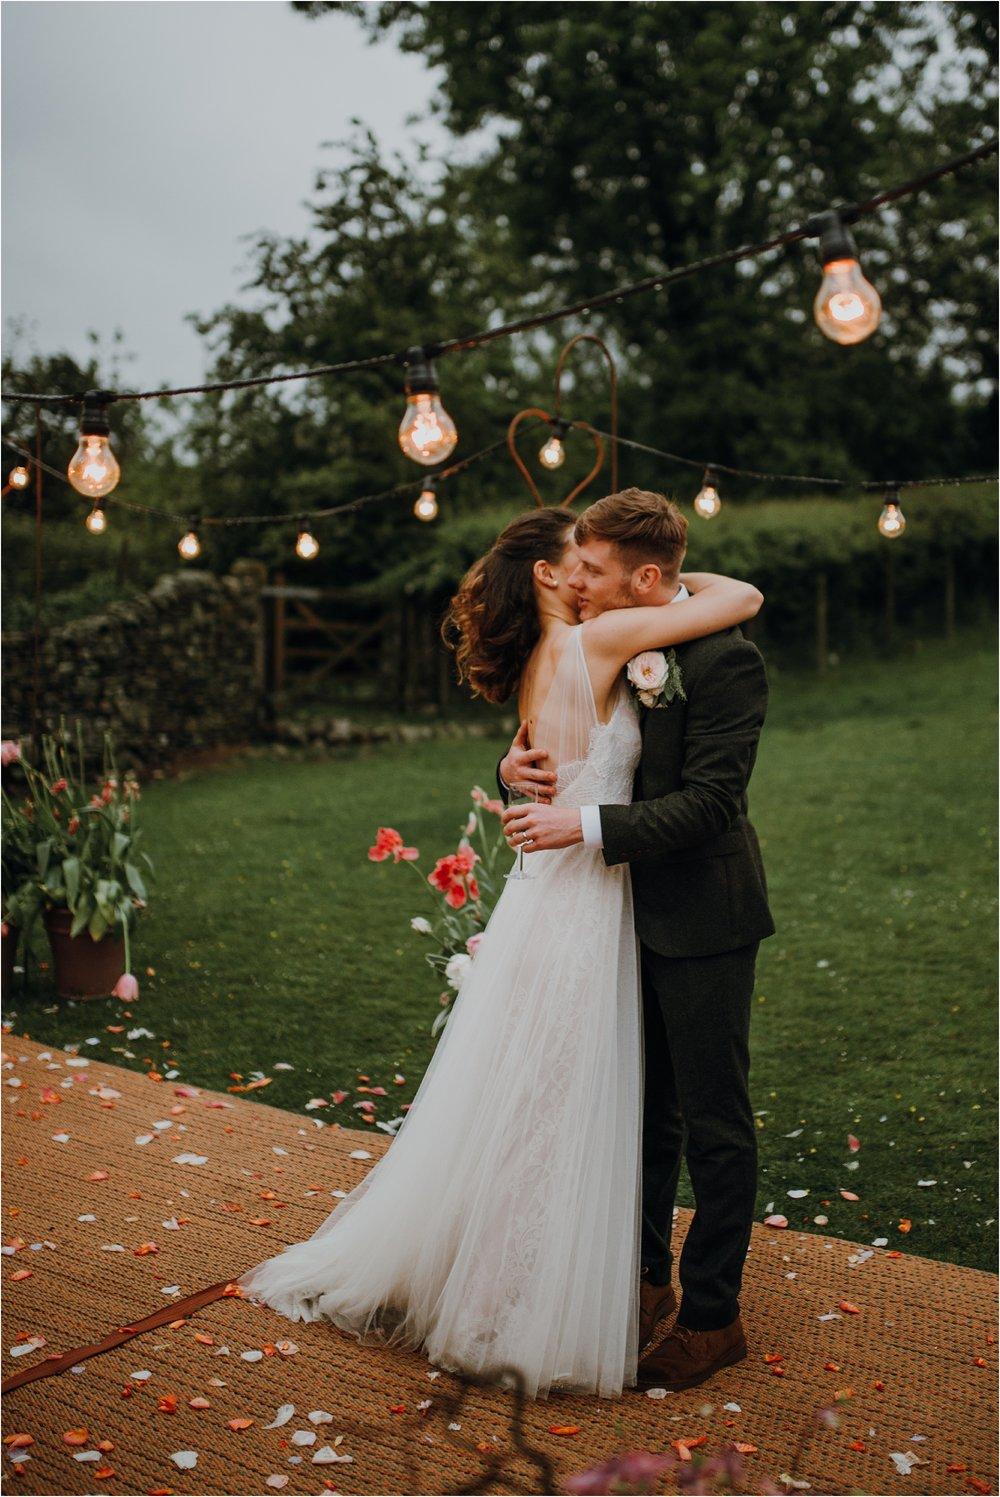 Outdoor-country-wedding-Edinburgh-photographer__0246.jpg